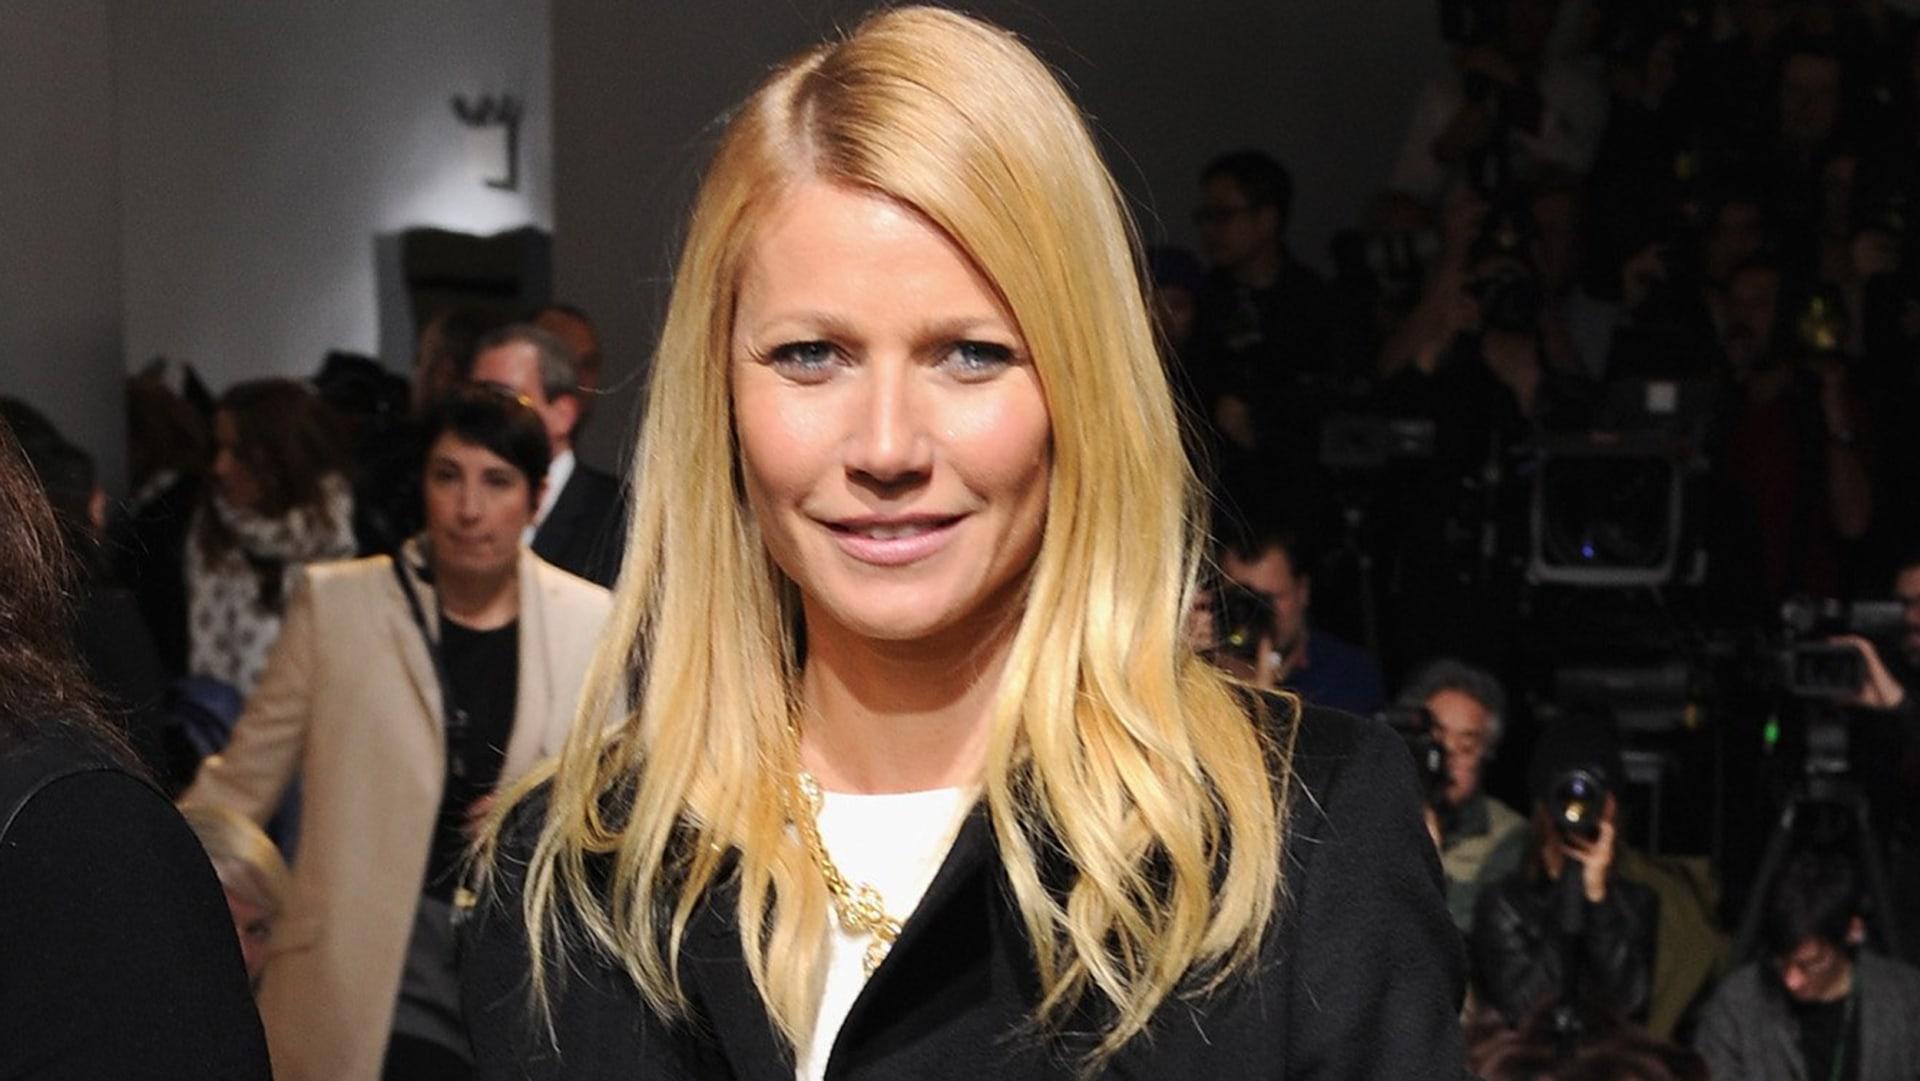 Image: Boss Women - Front Row - Mercedes-Benz Fashion Week Fall 2014